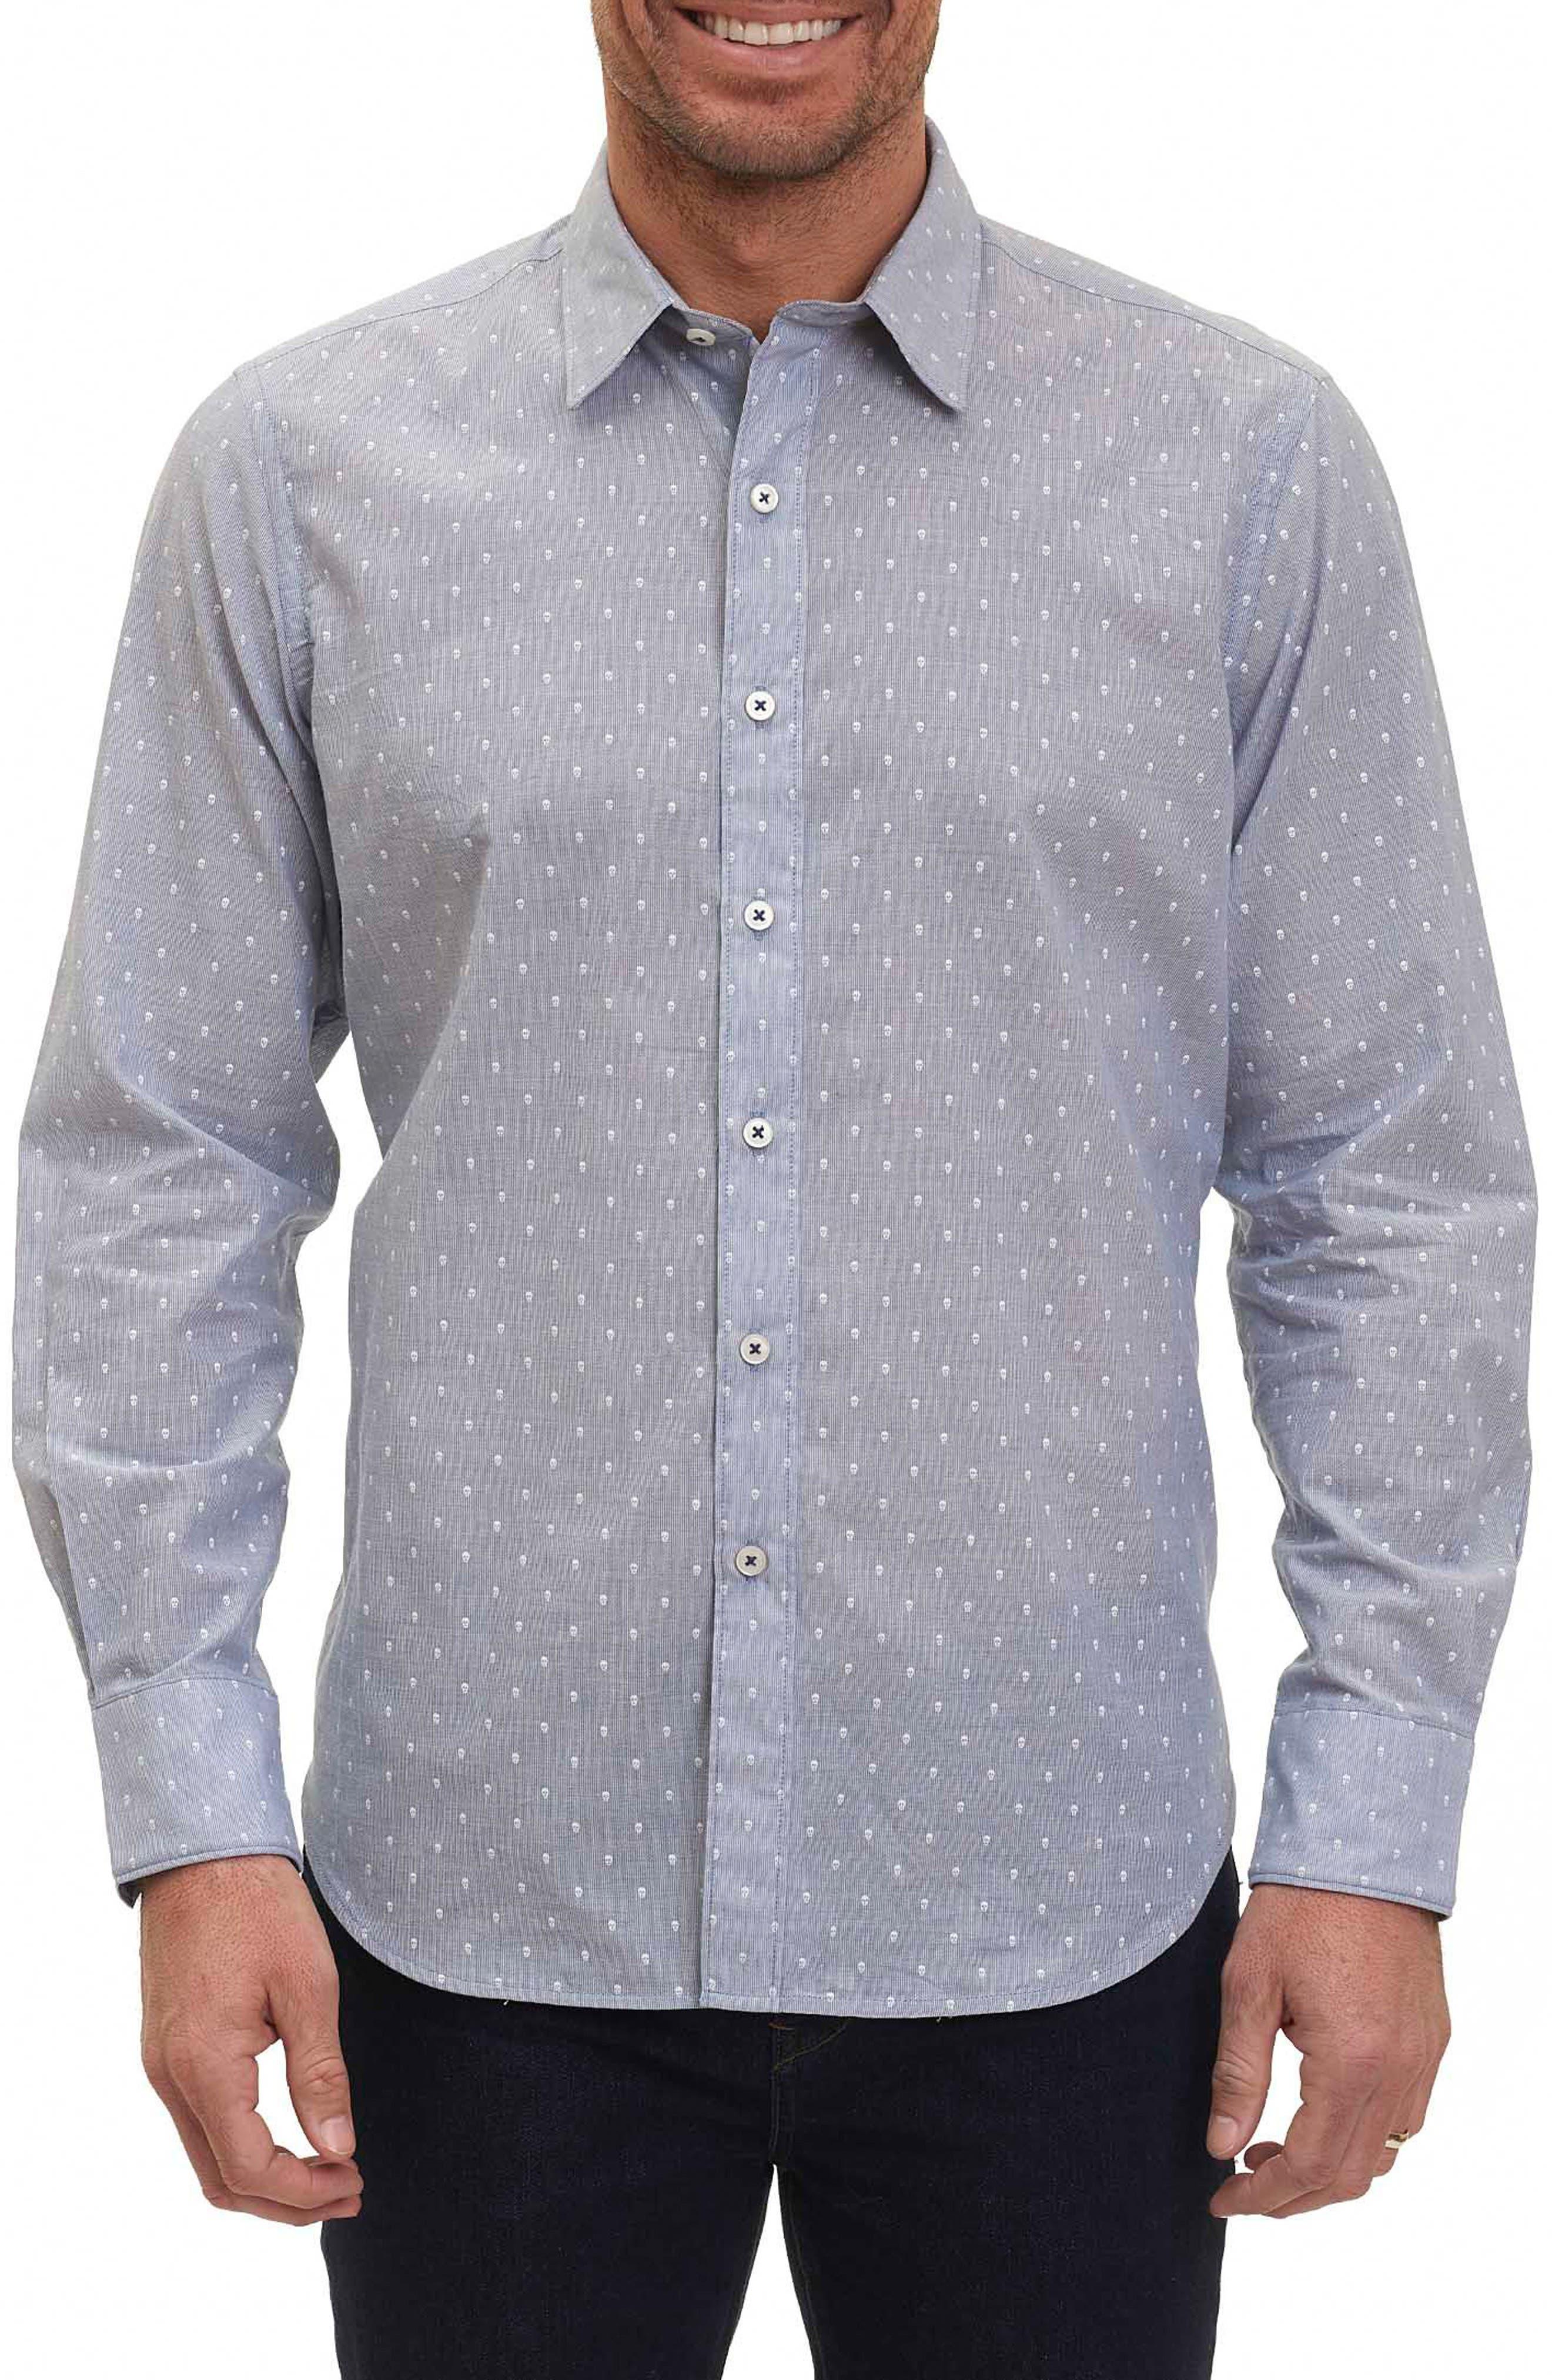 Alternate Image 1 Selected - Robert Graham Dogtown Stripe Sport Shirt